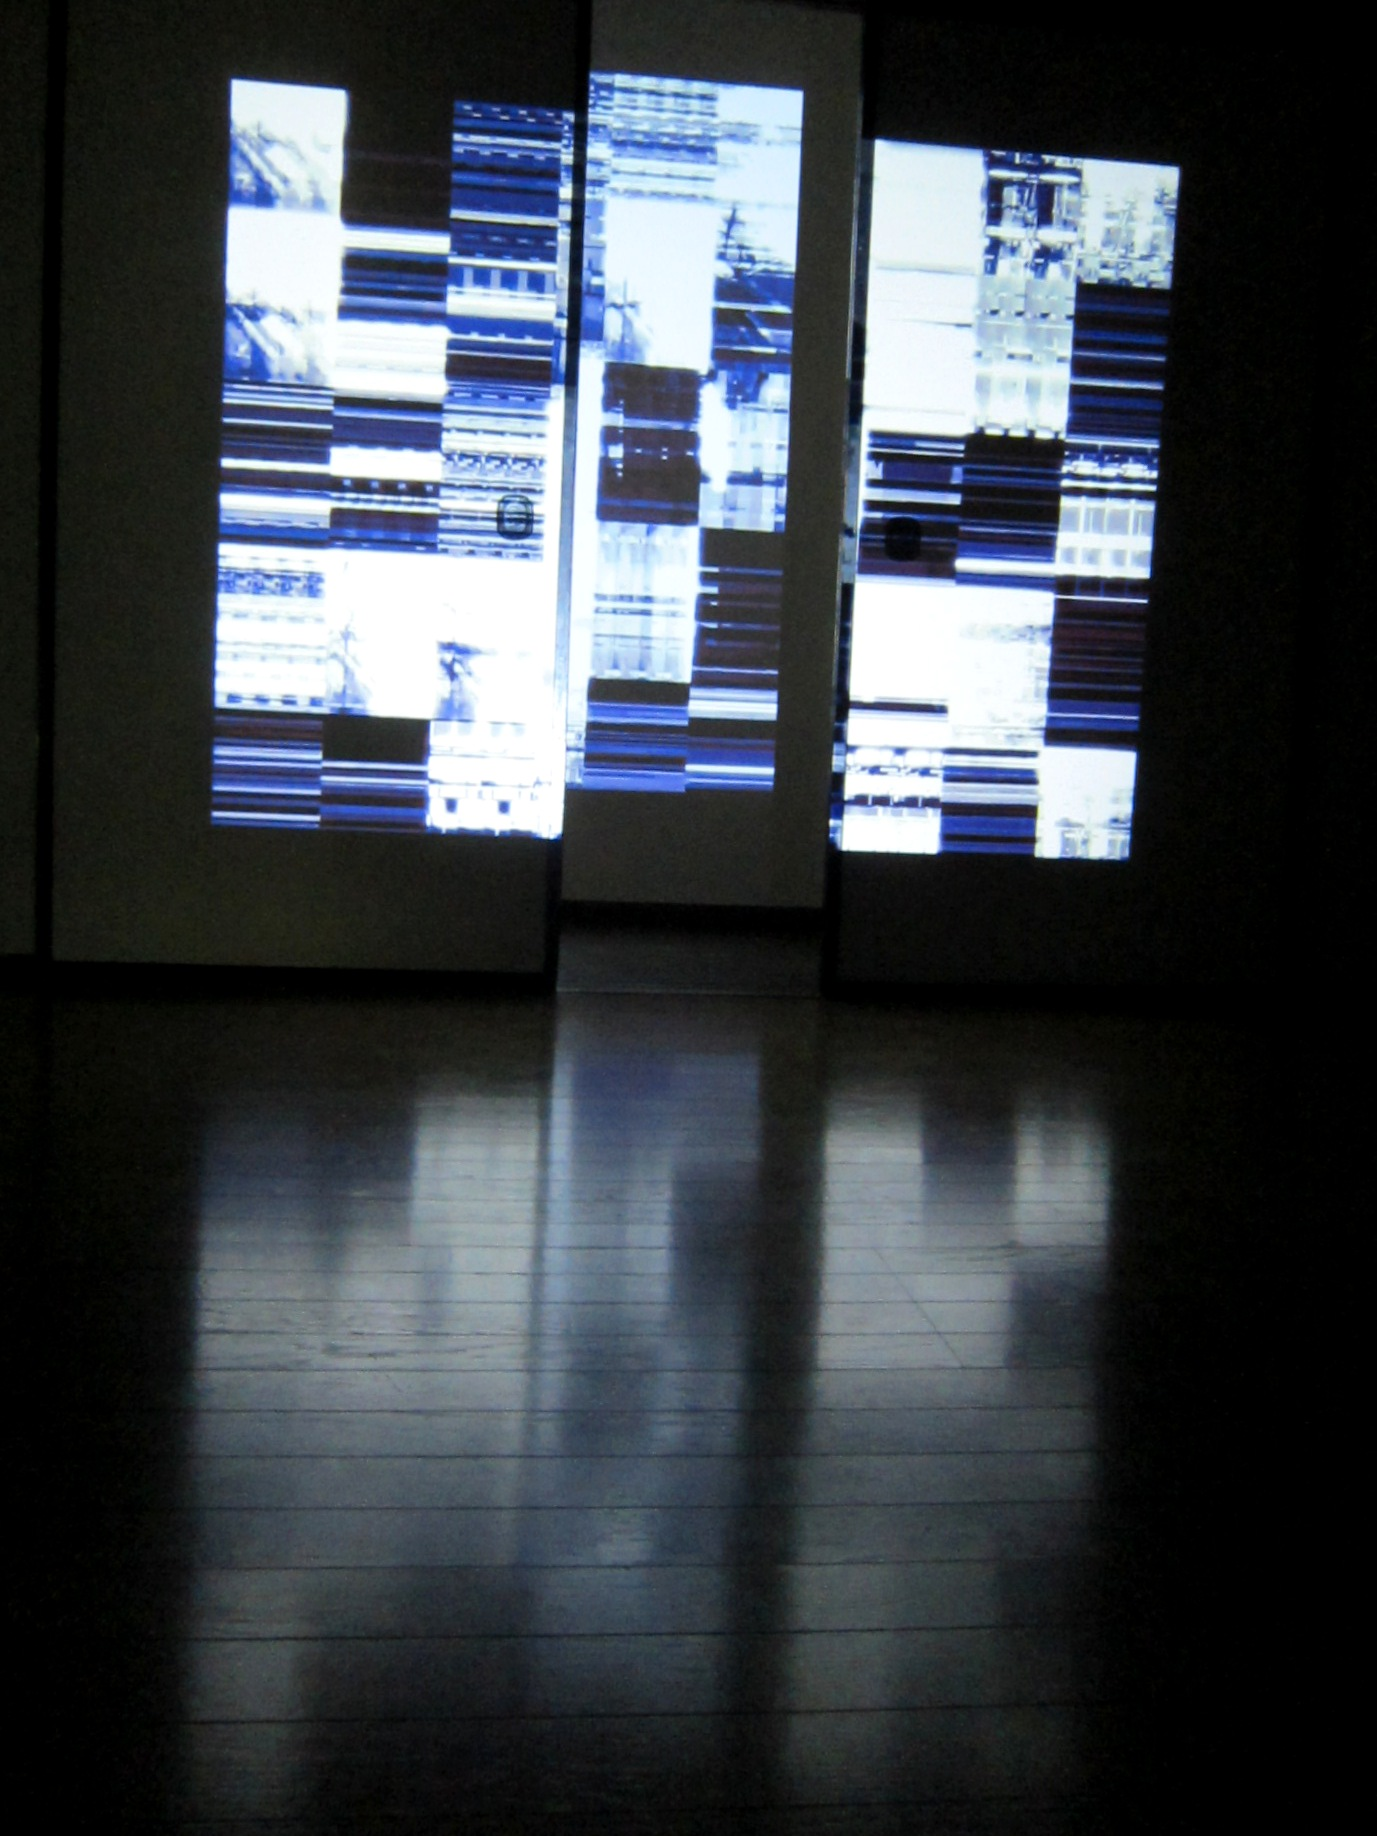 2035)「上野麗市 個展 『De\'tente デタント』」 g.犬養 4月17日(水)~4月29日(月)_f0126829_10454645.jpg